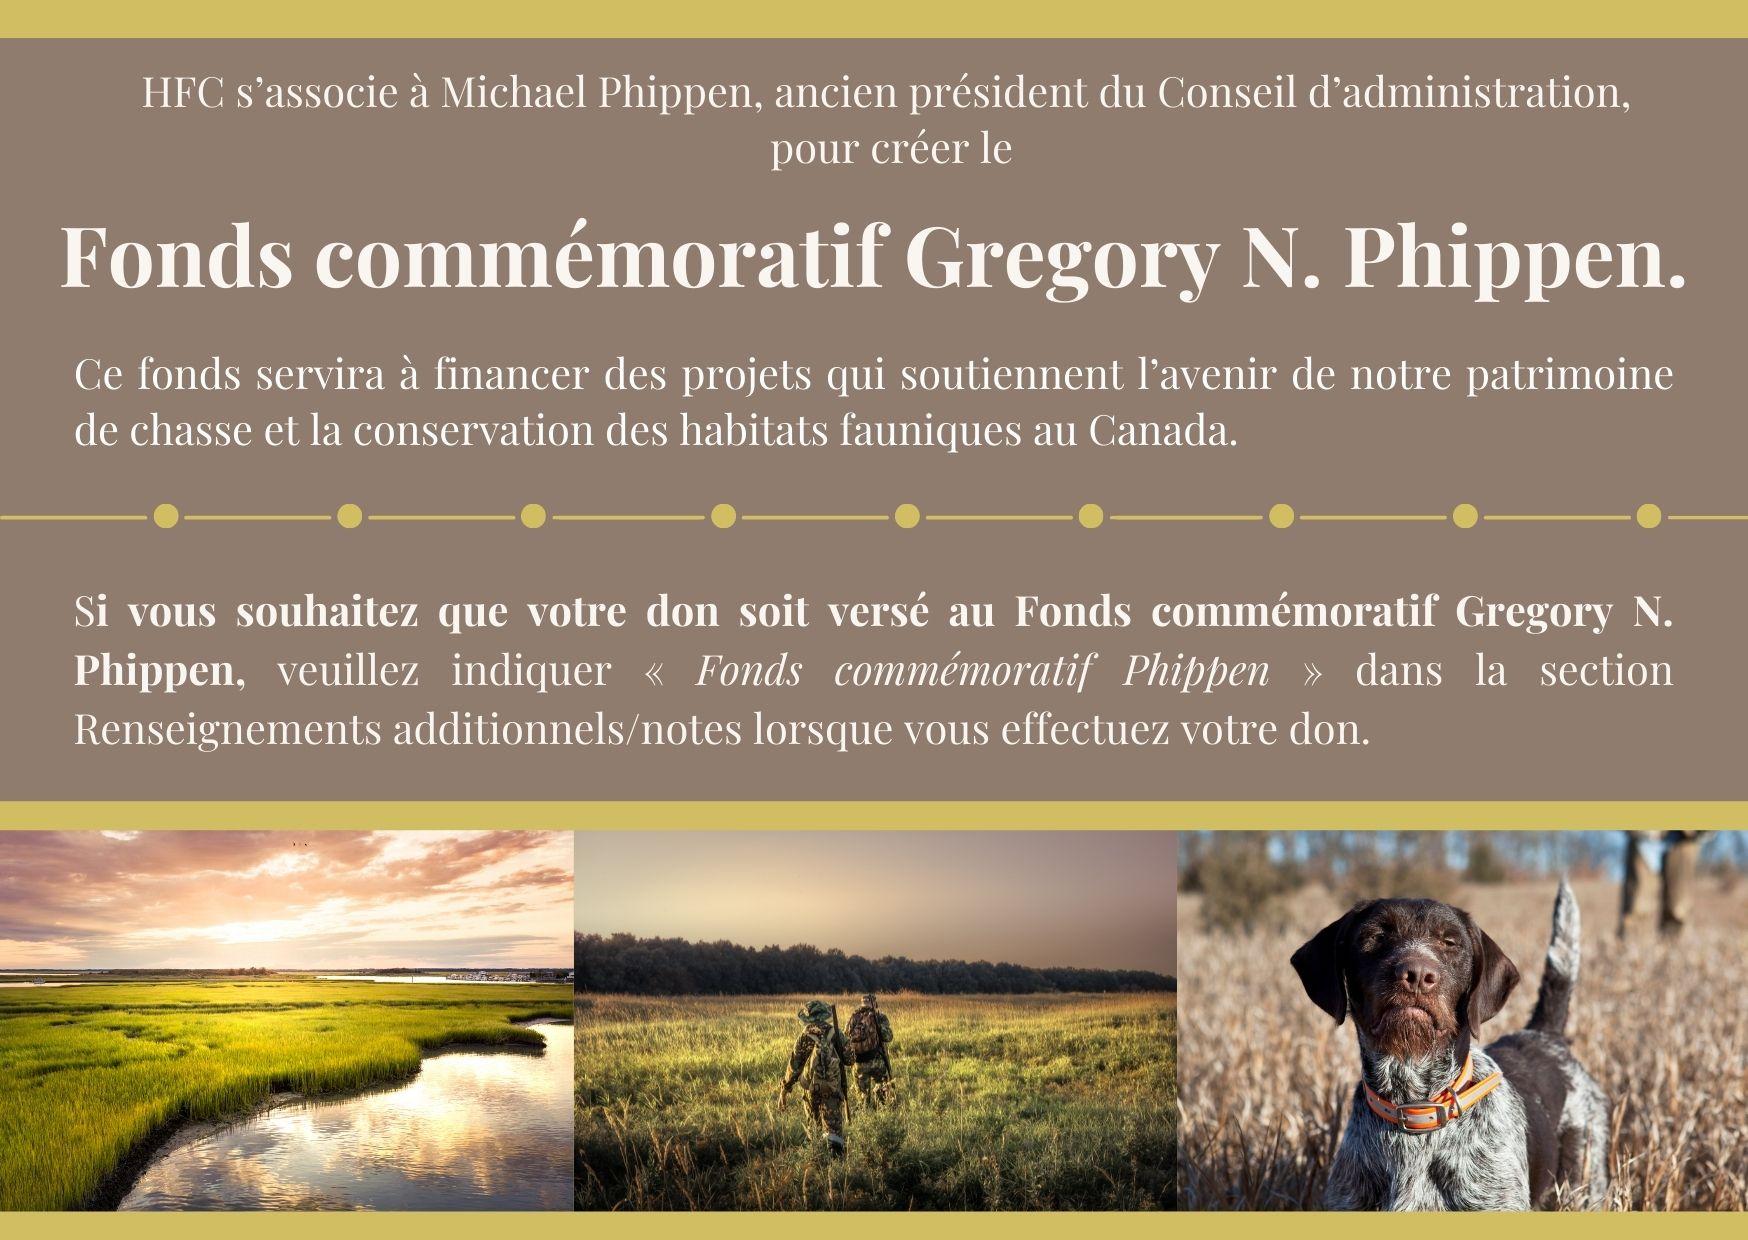 Fonds commémoratif Gregory N. Phippen.